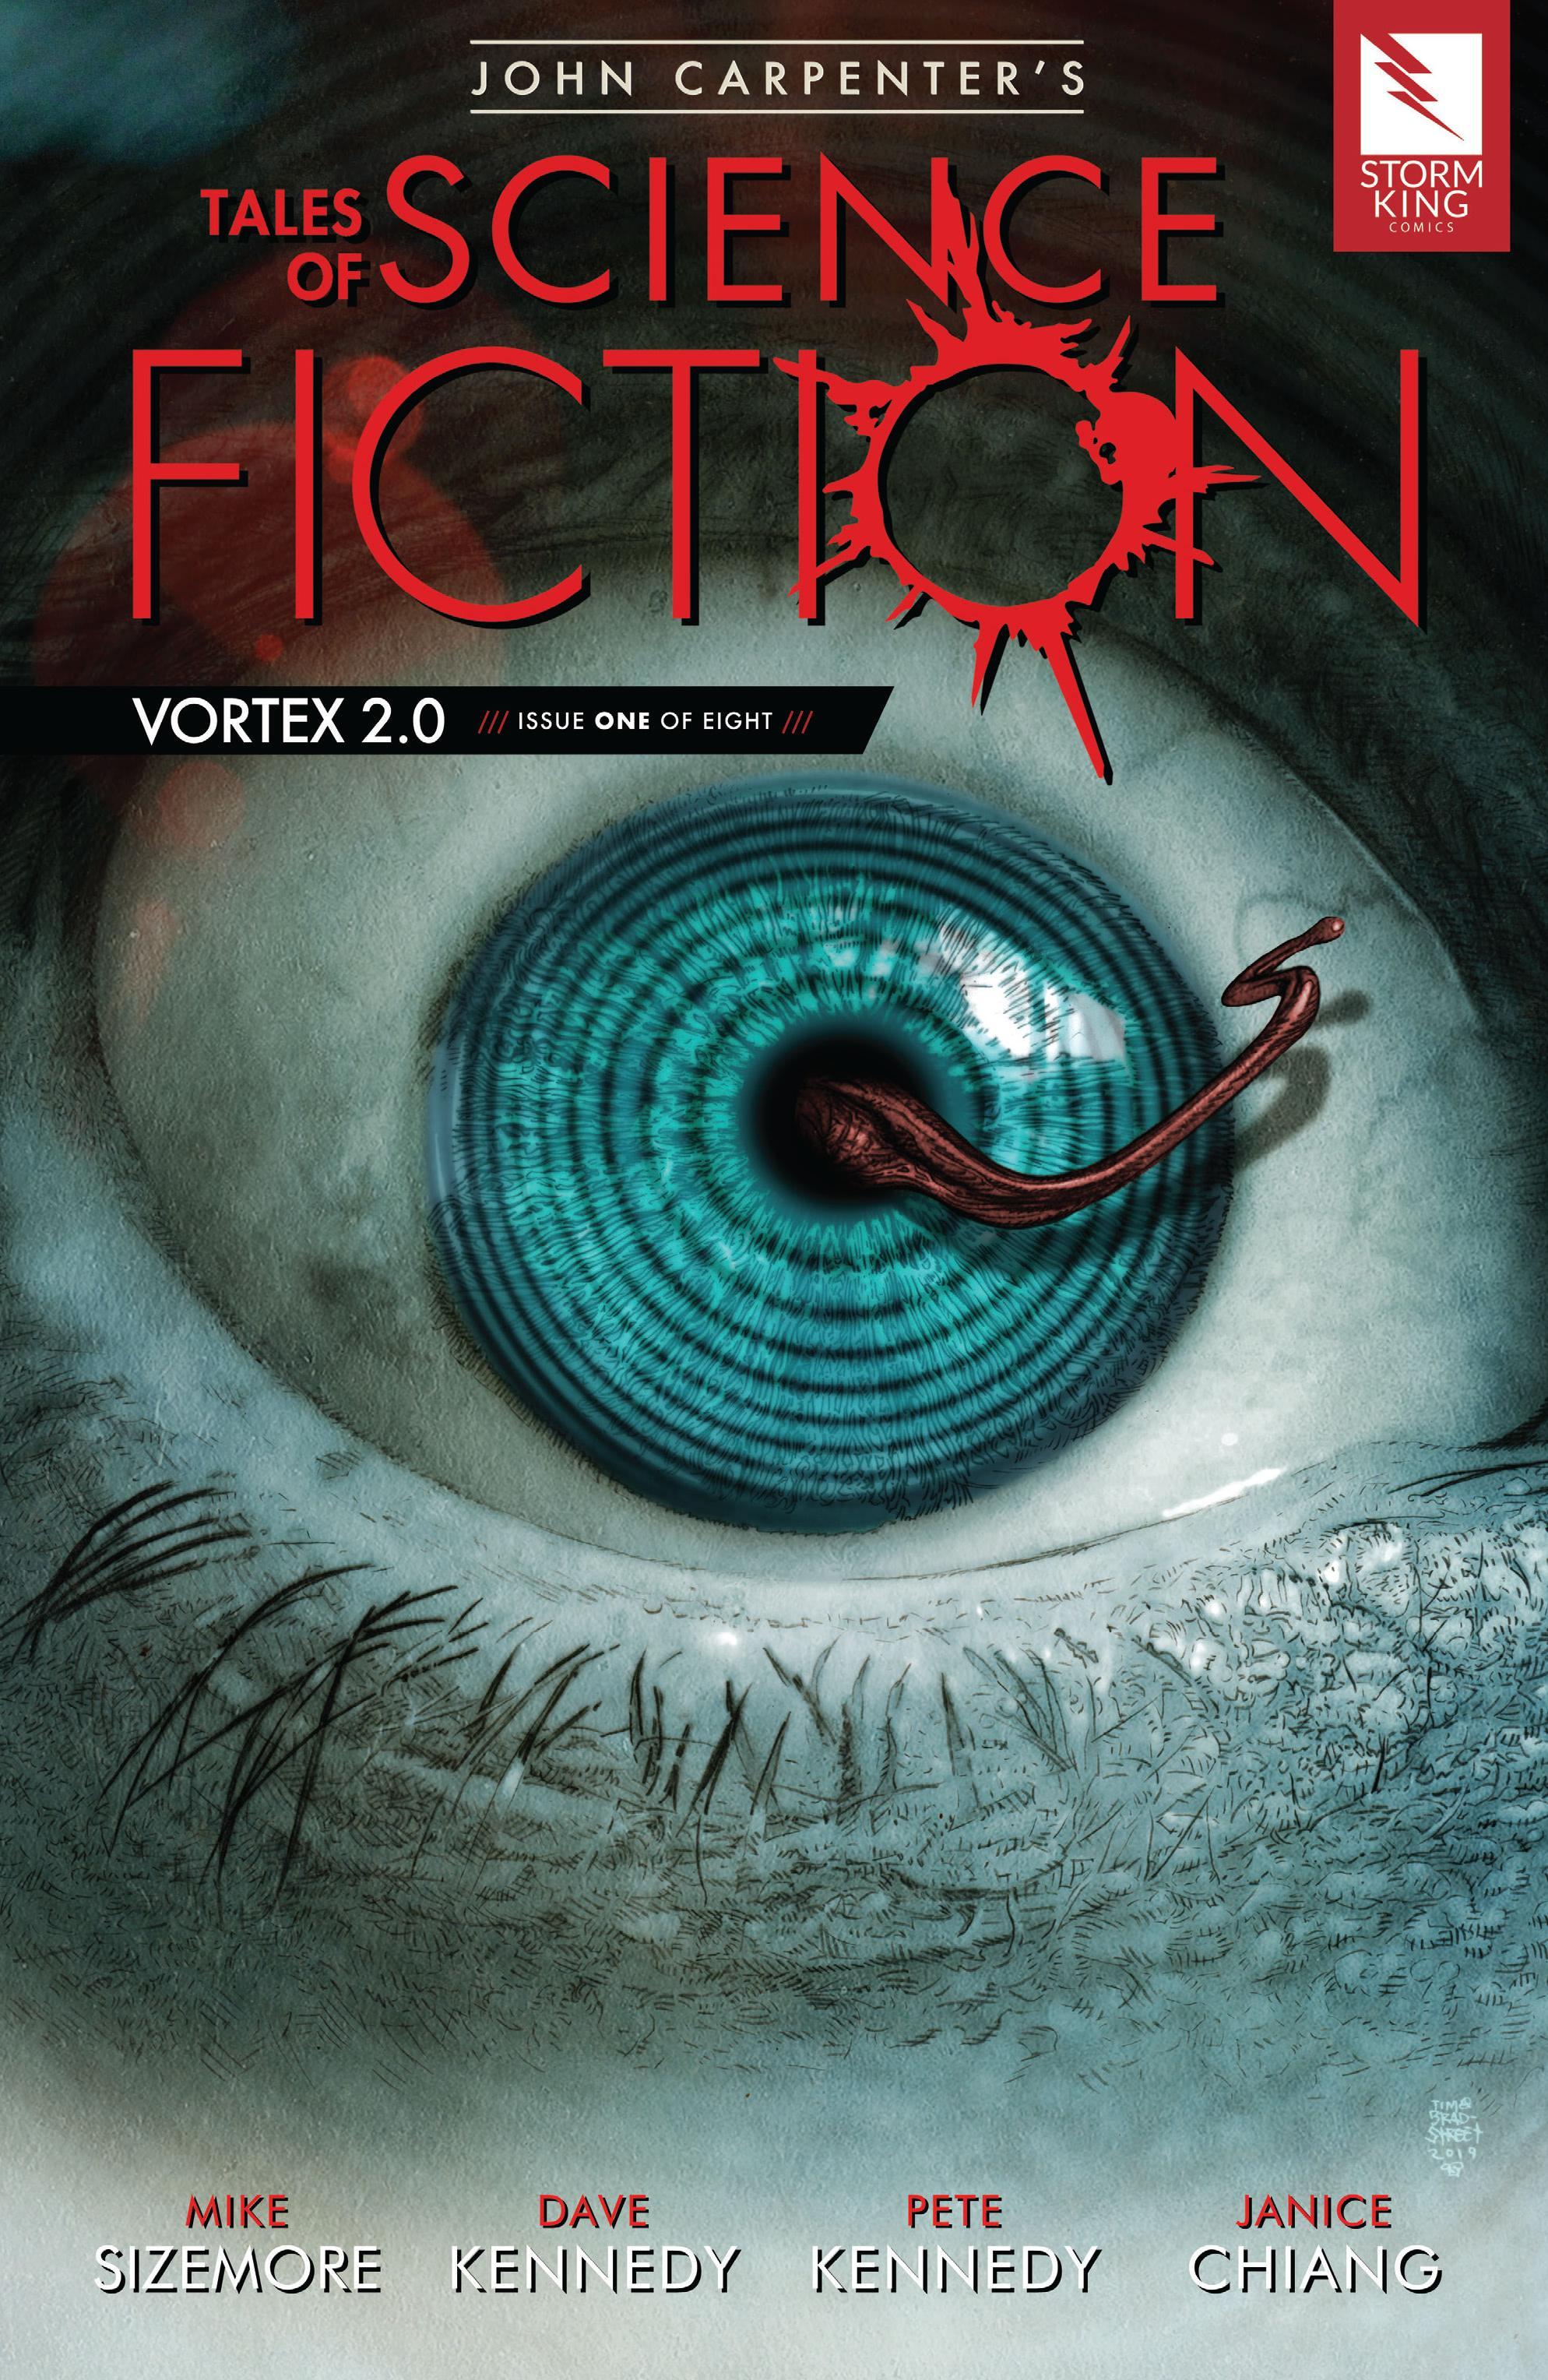 John Carpenters Tales of Science Fiction-Vortex 2 0 01 of 08 2020 digital The Magicians